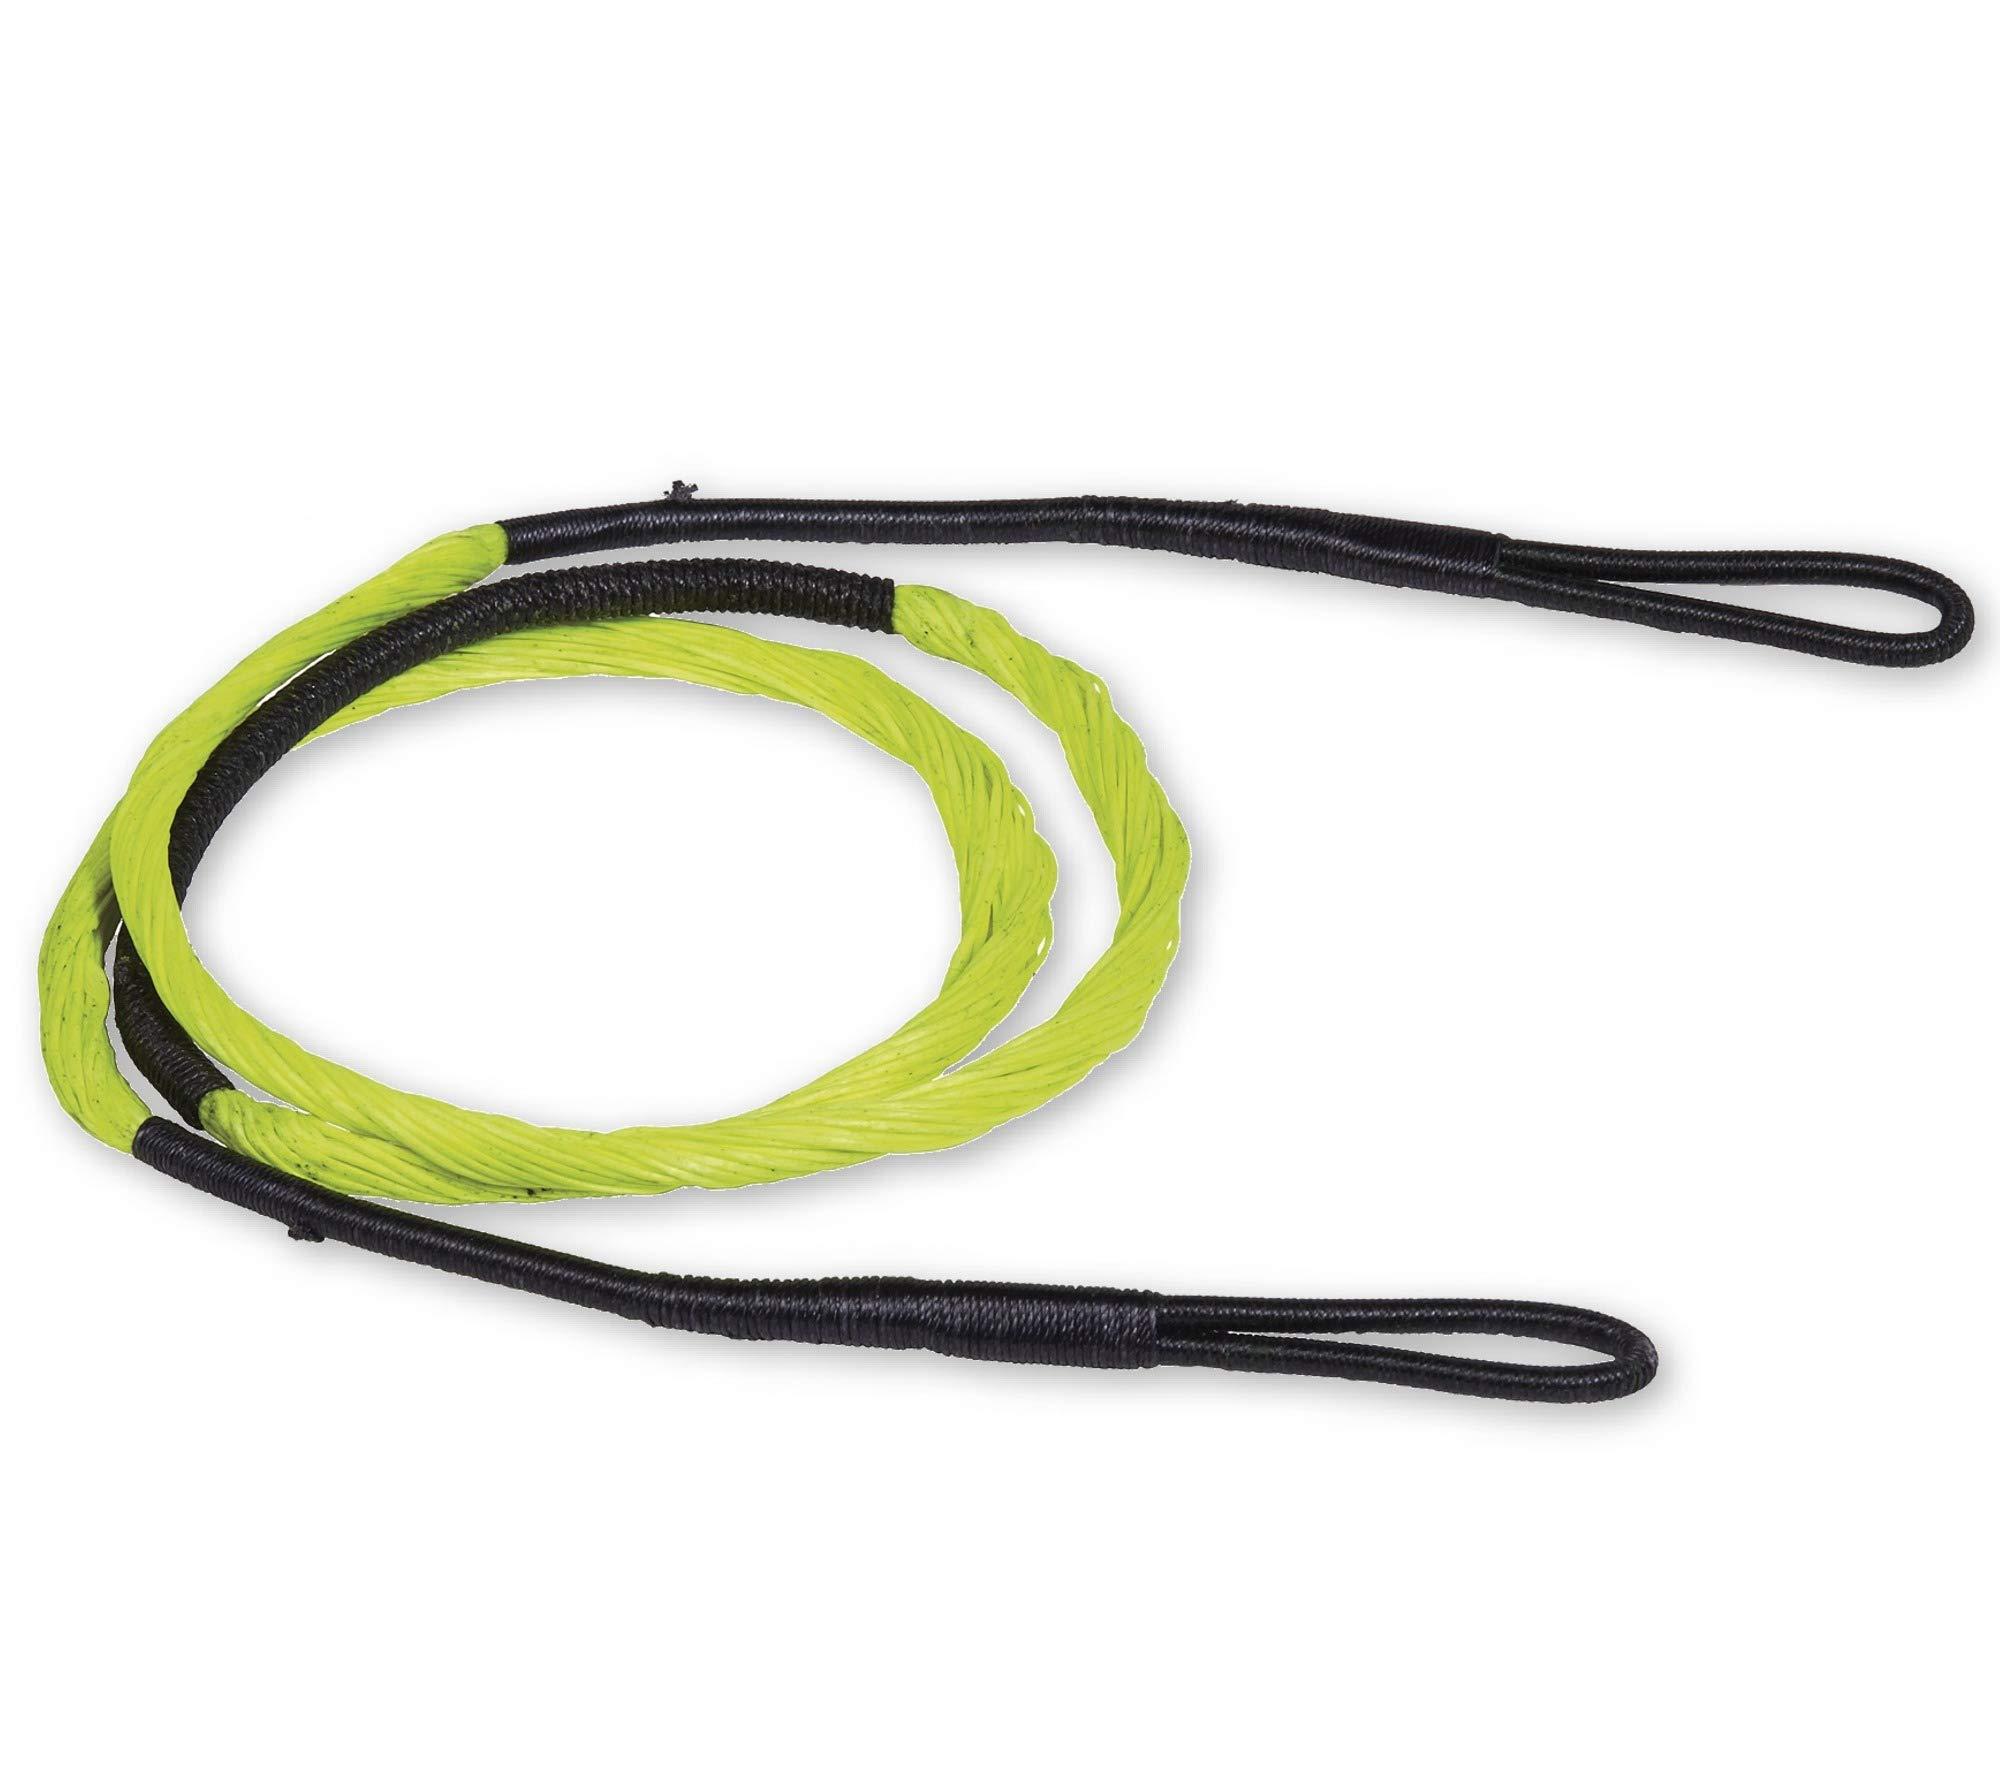 Excalibur Matrix Crossbow String, Hornet Yellow, Regular